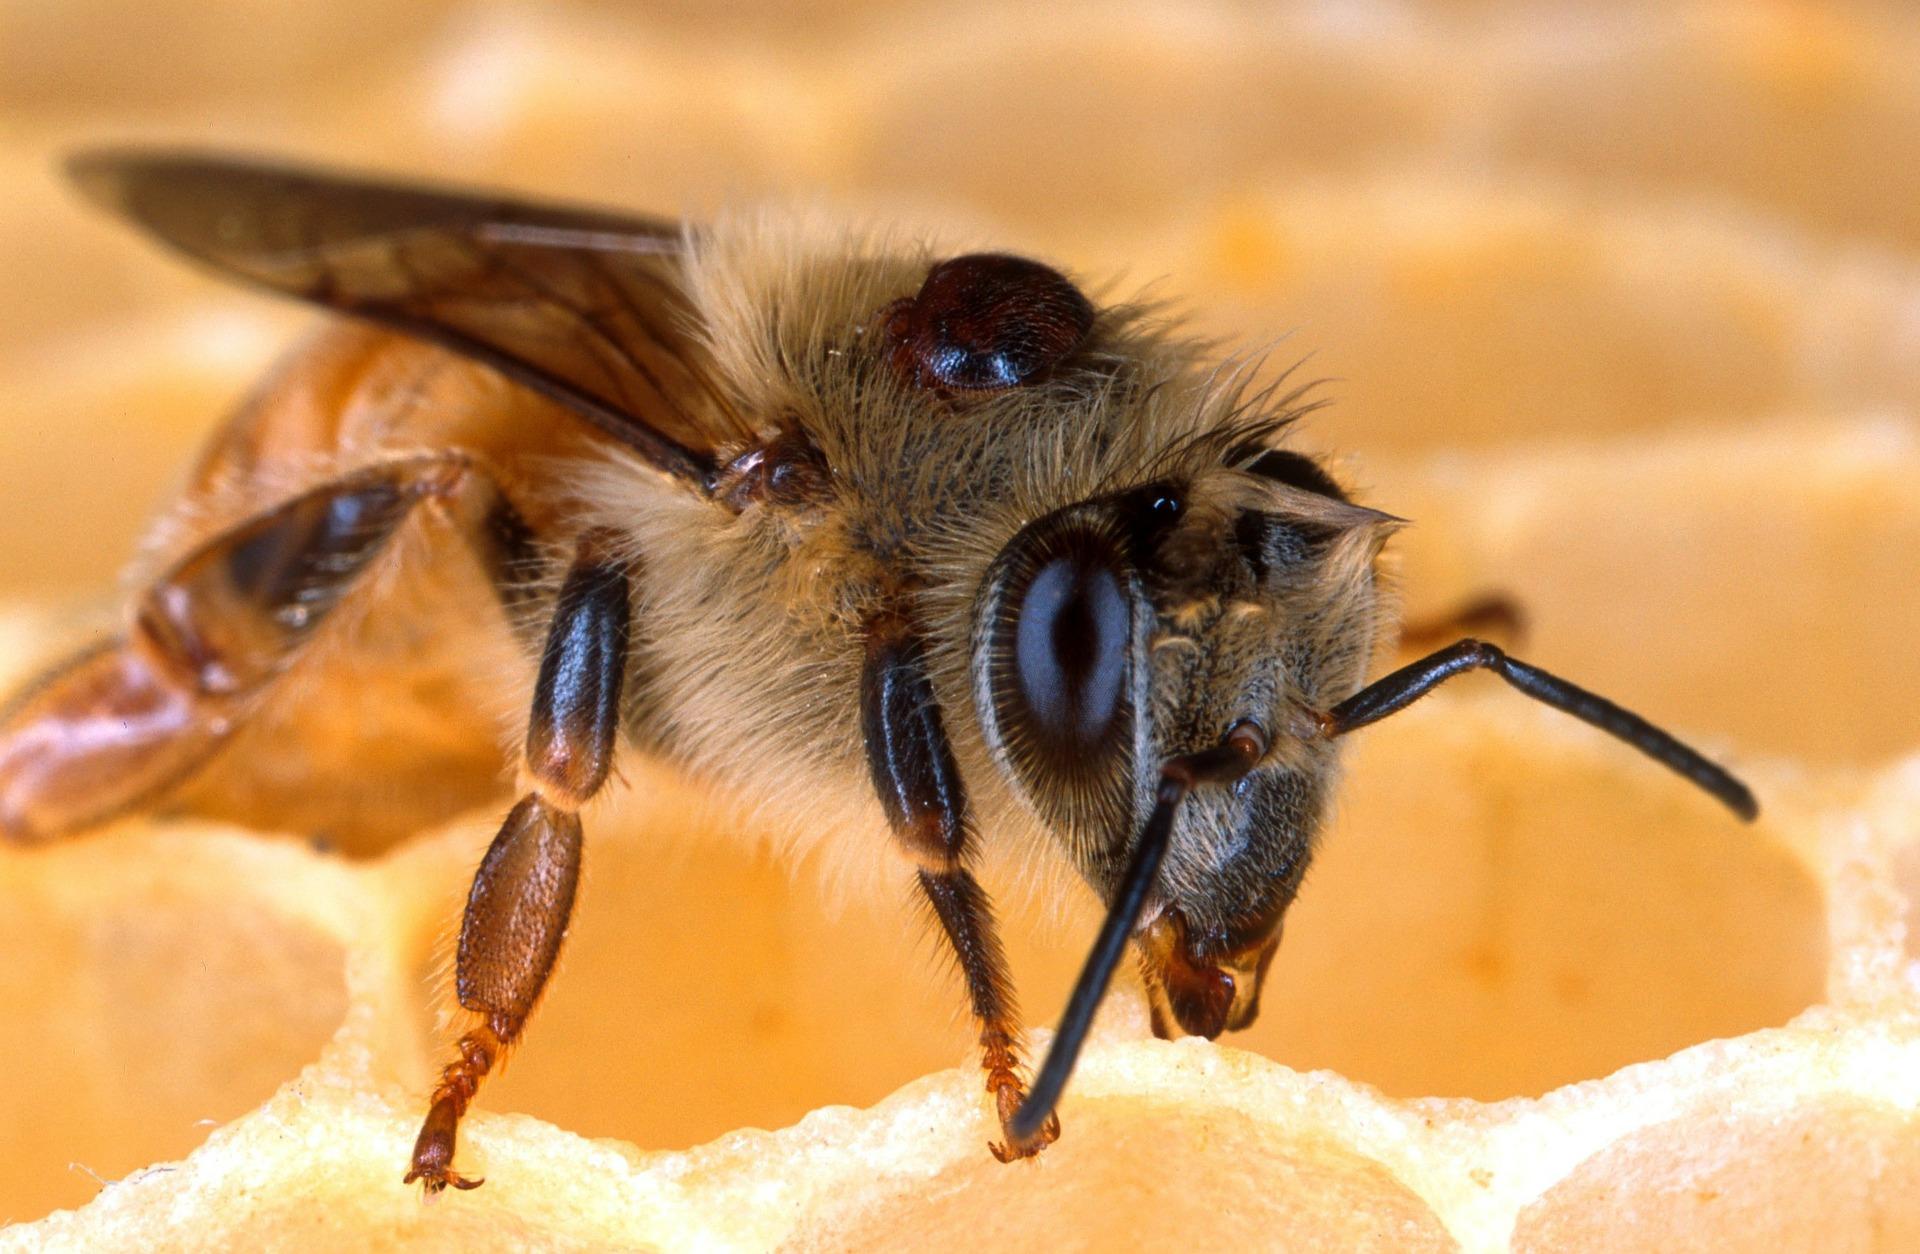 Bienenschädling Varroa Milbe